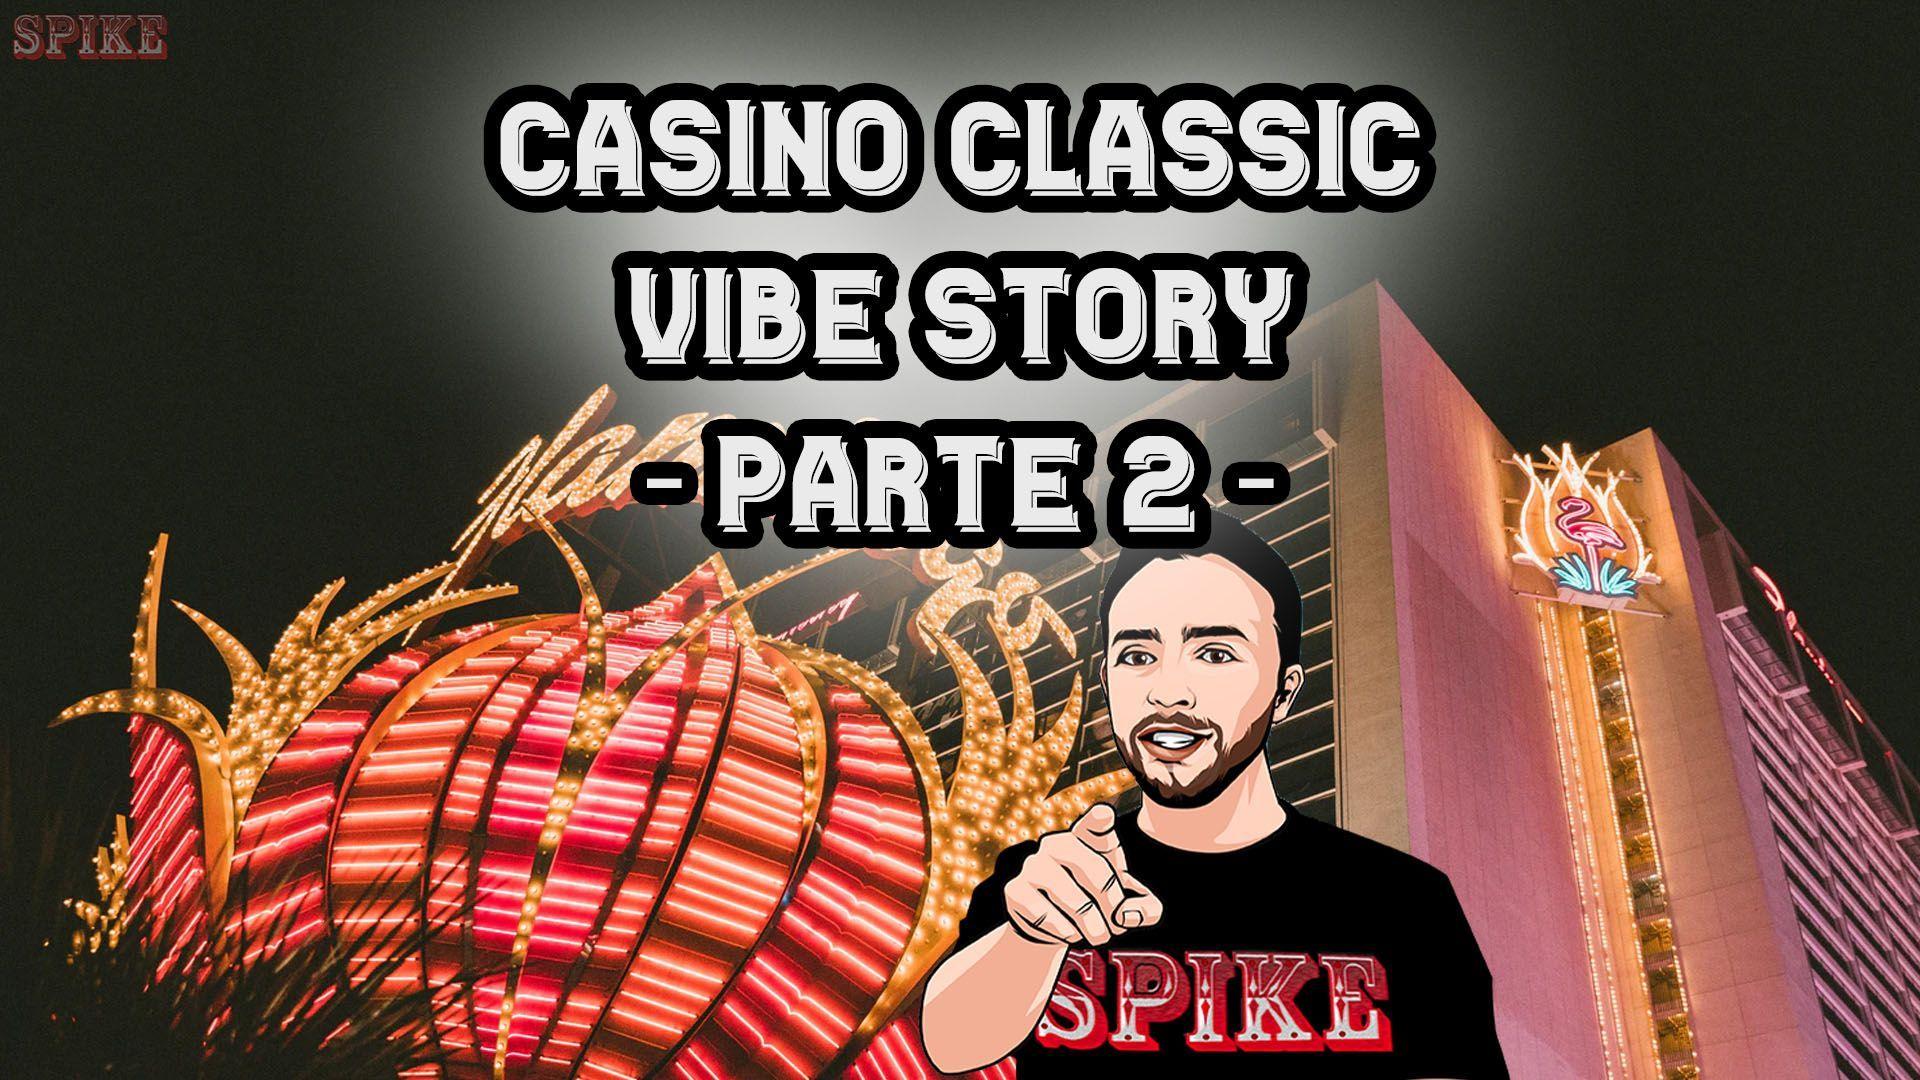 Casino Classic Vibe Story 2